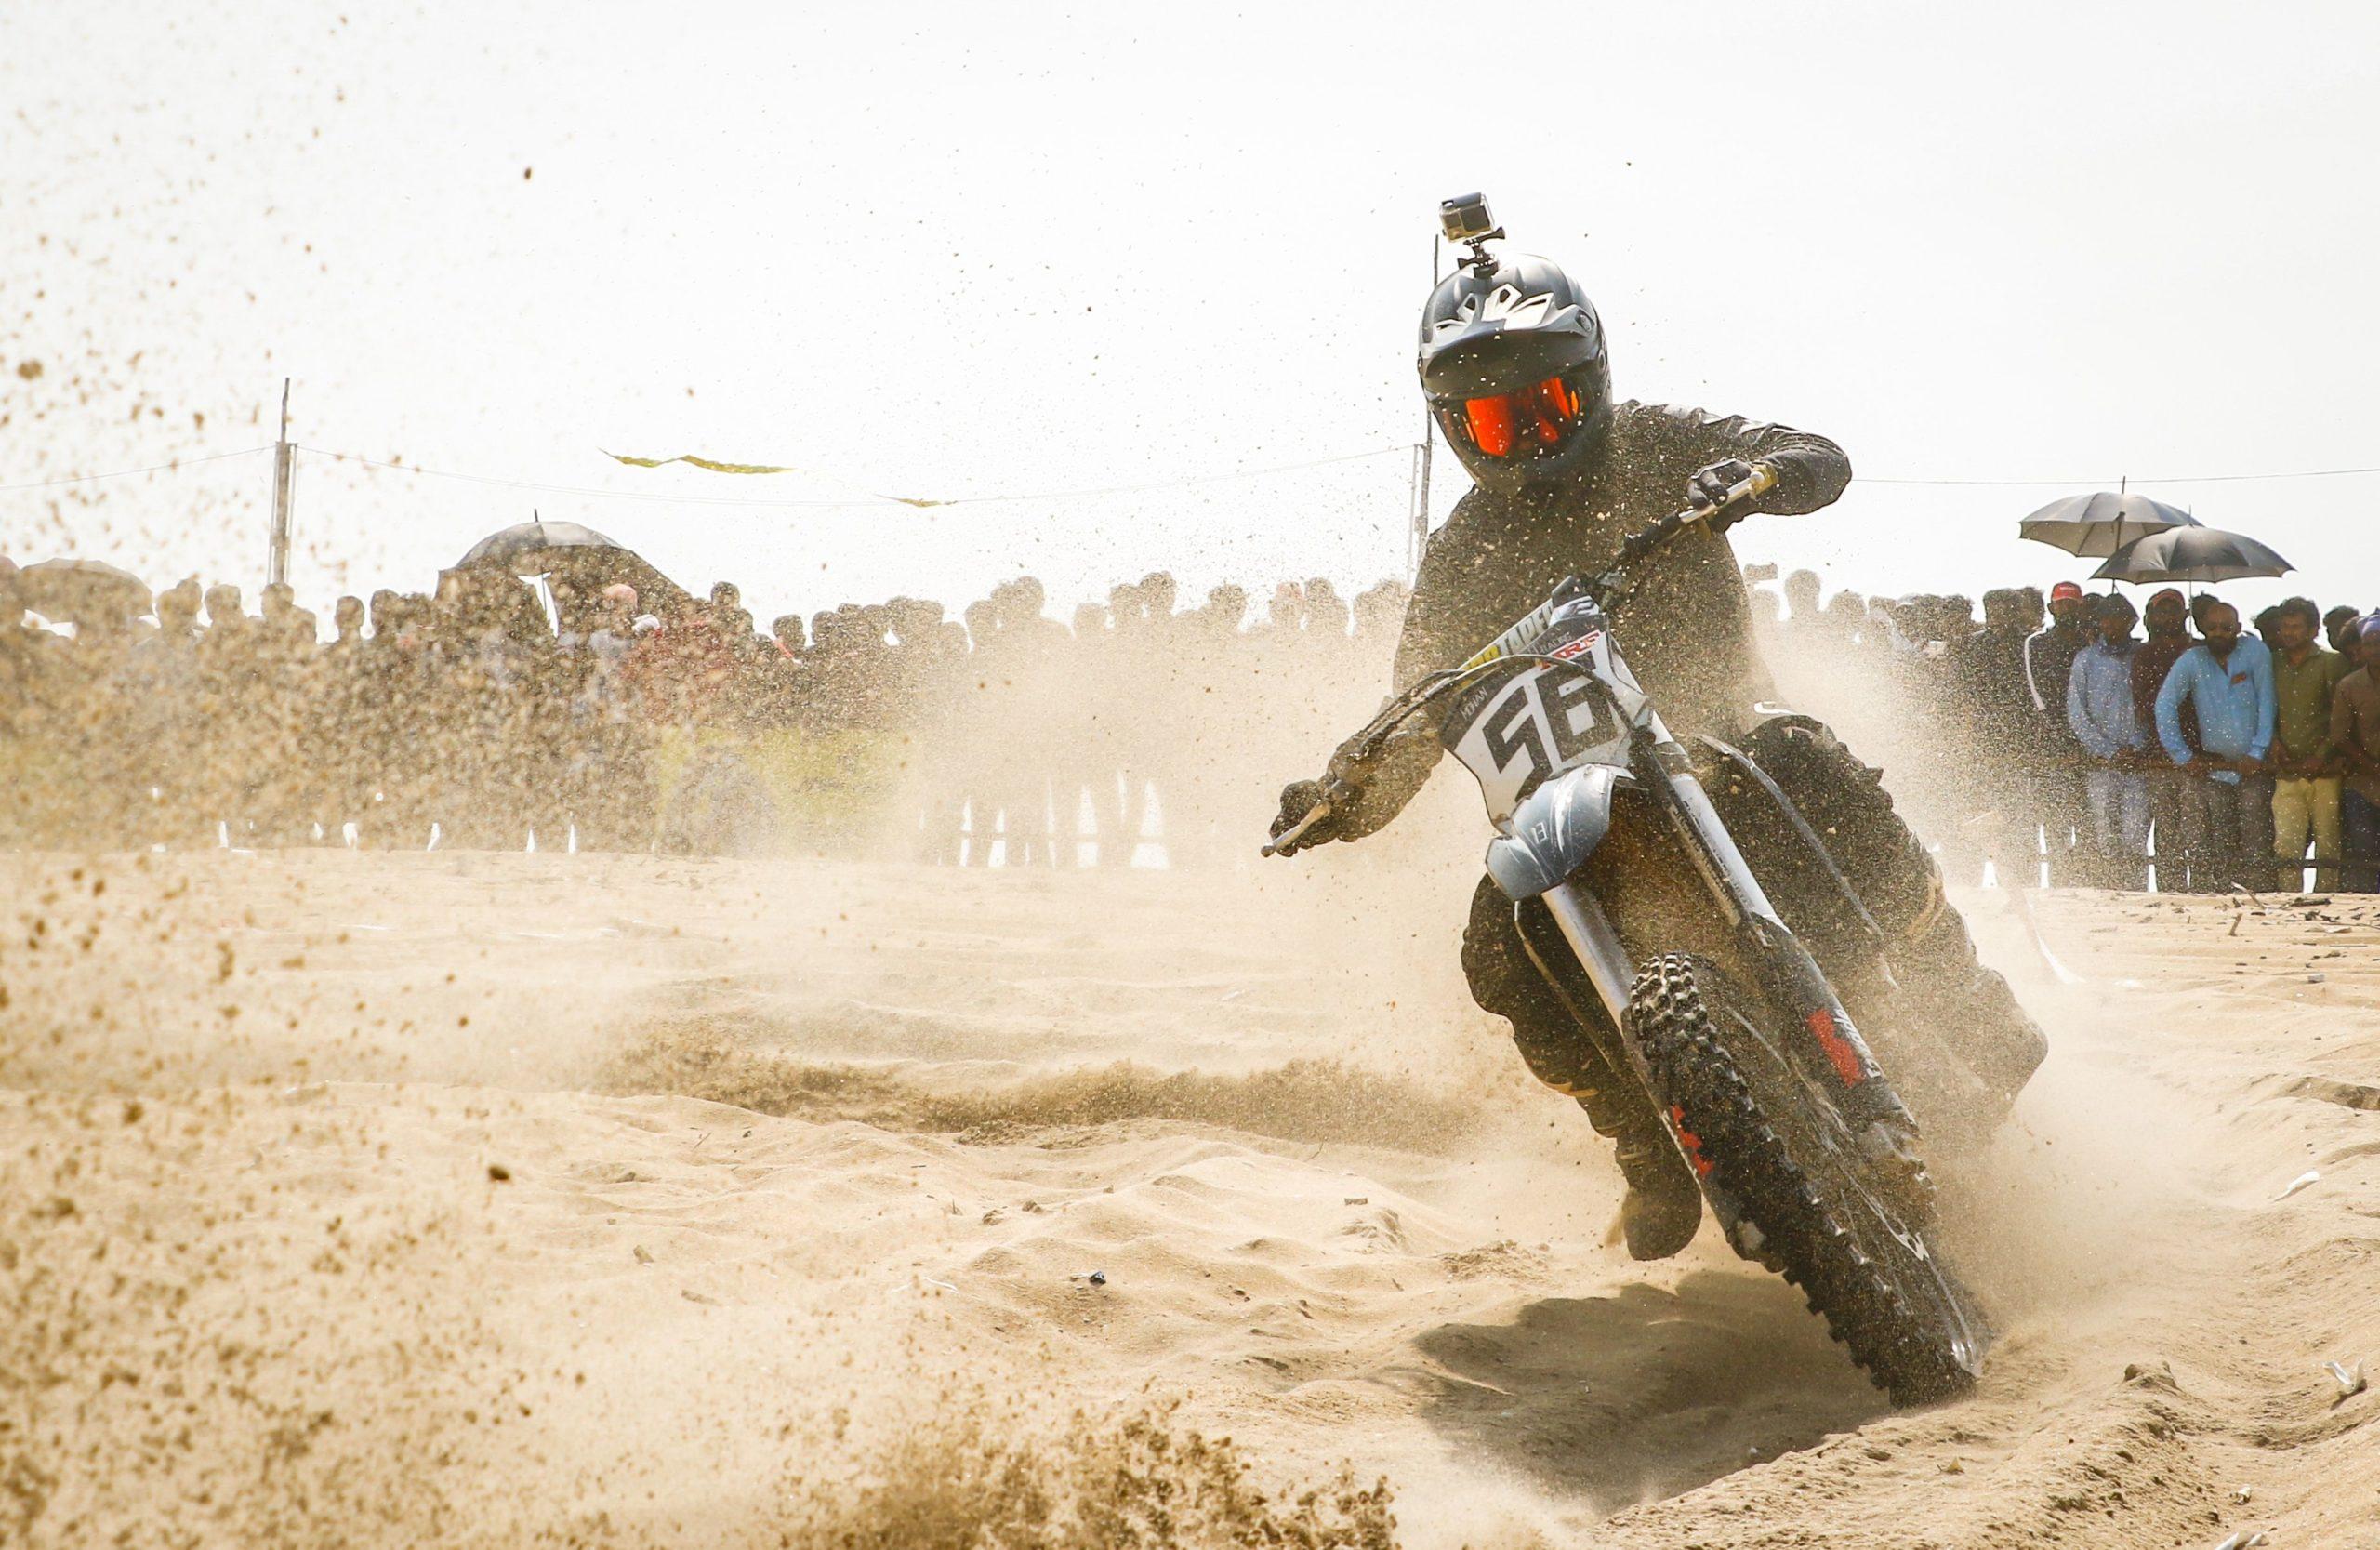 Best Action Camera for Dirt Biking (Top 3 Picks for 2020)